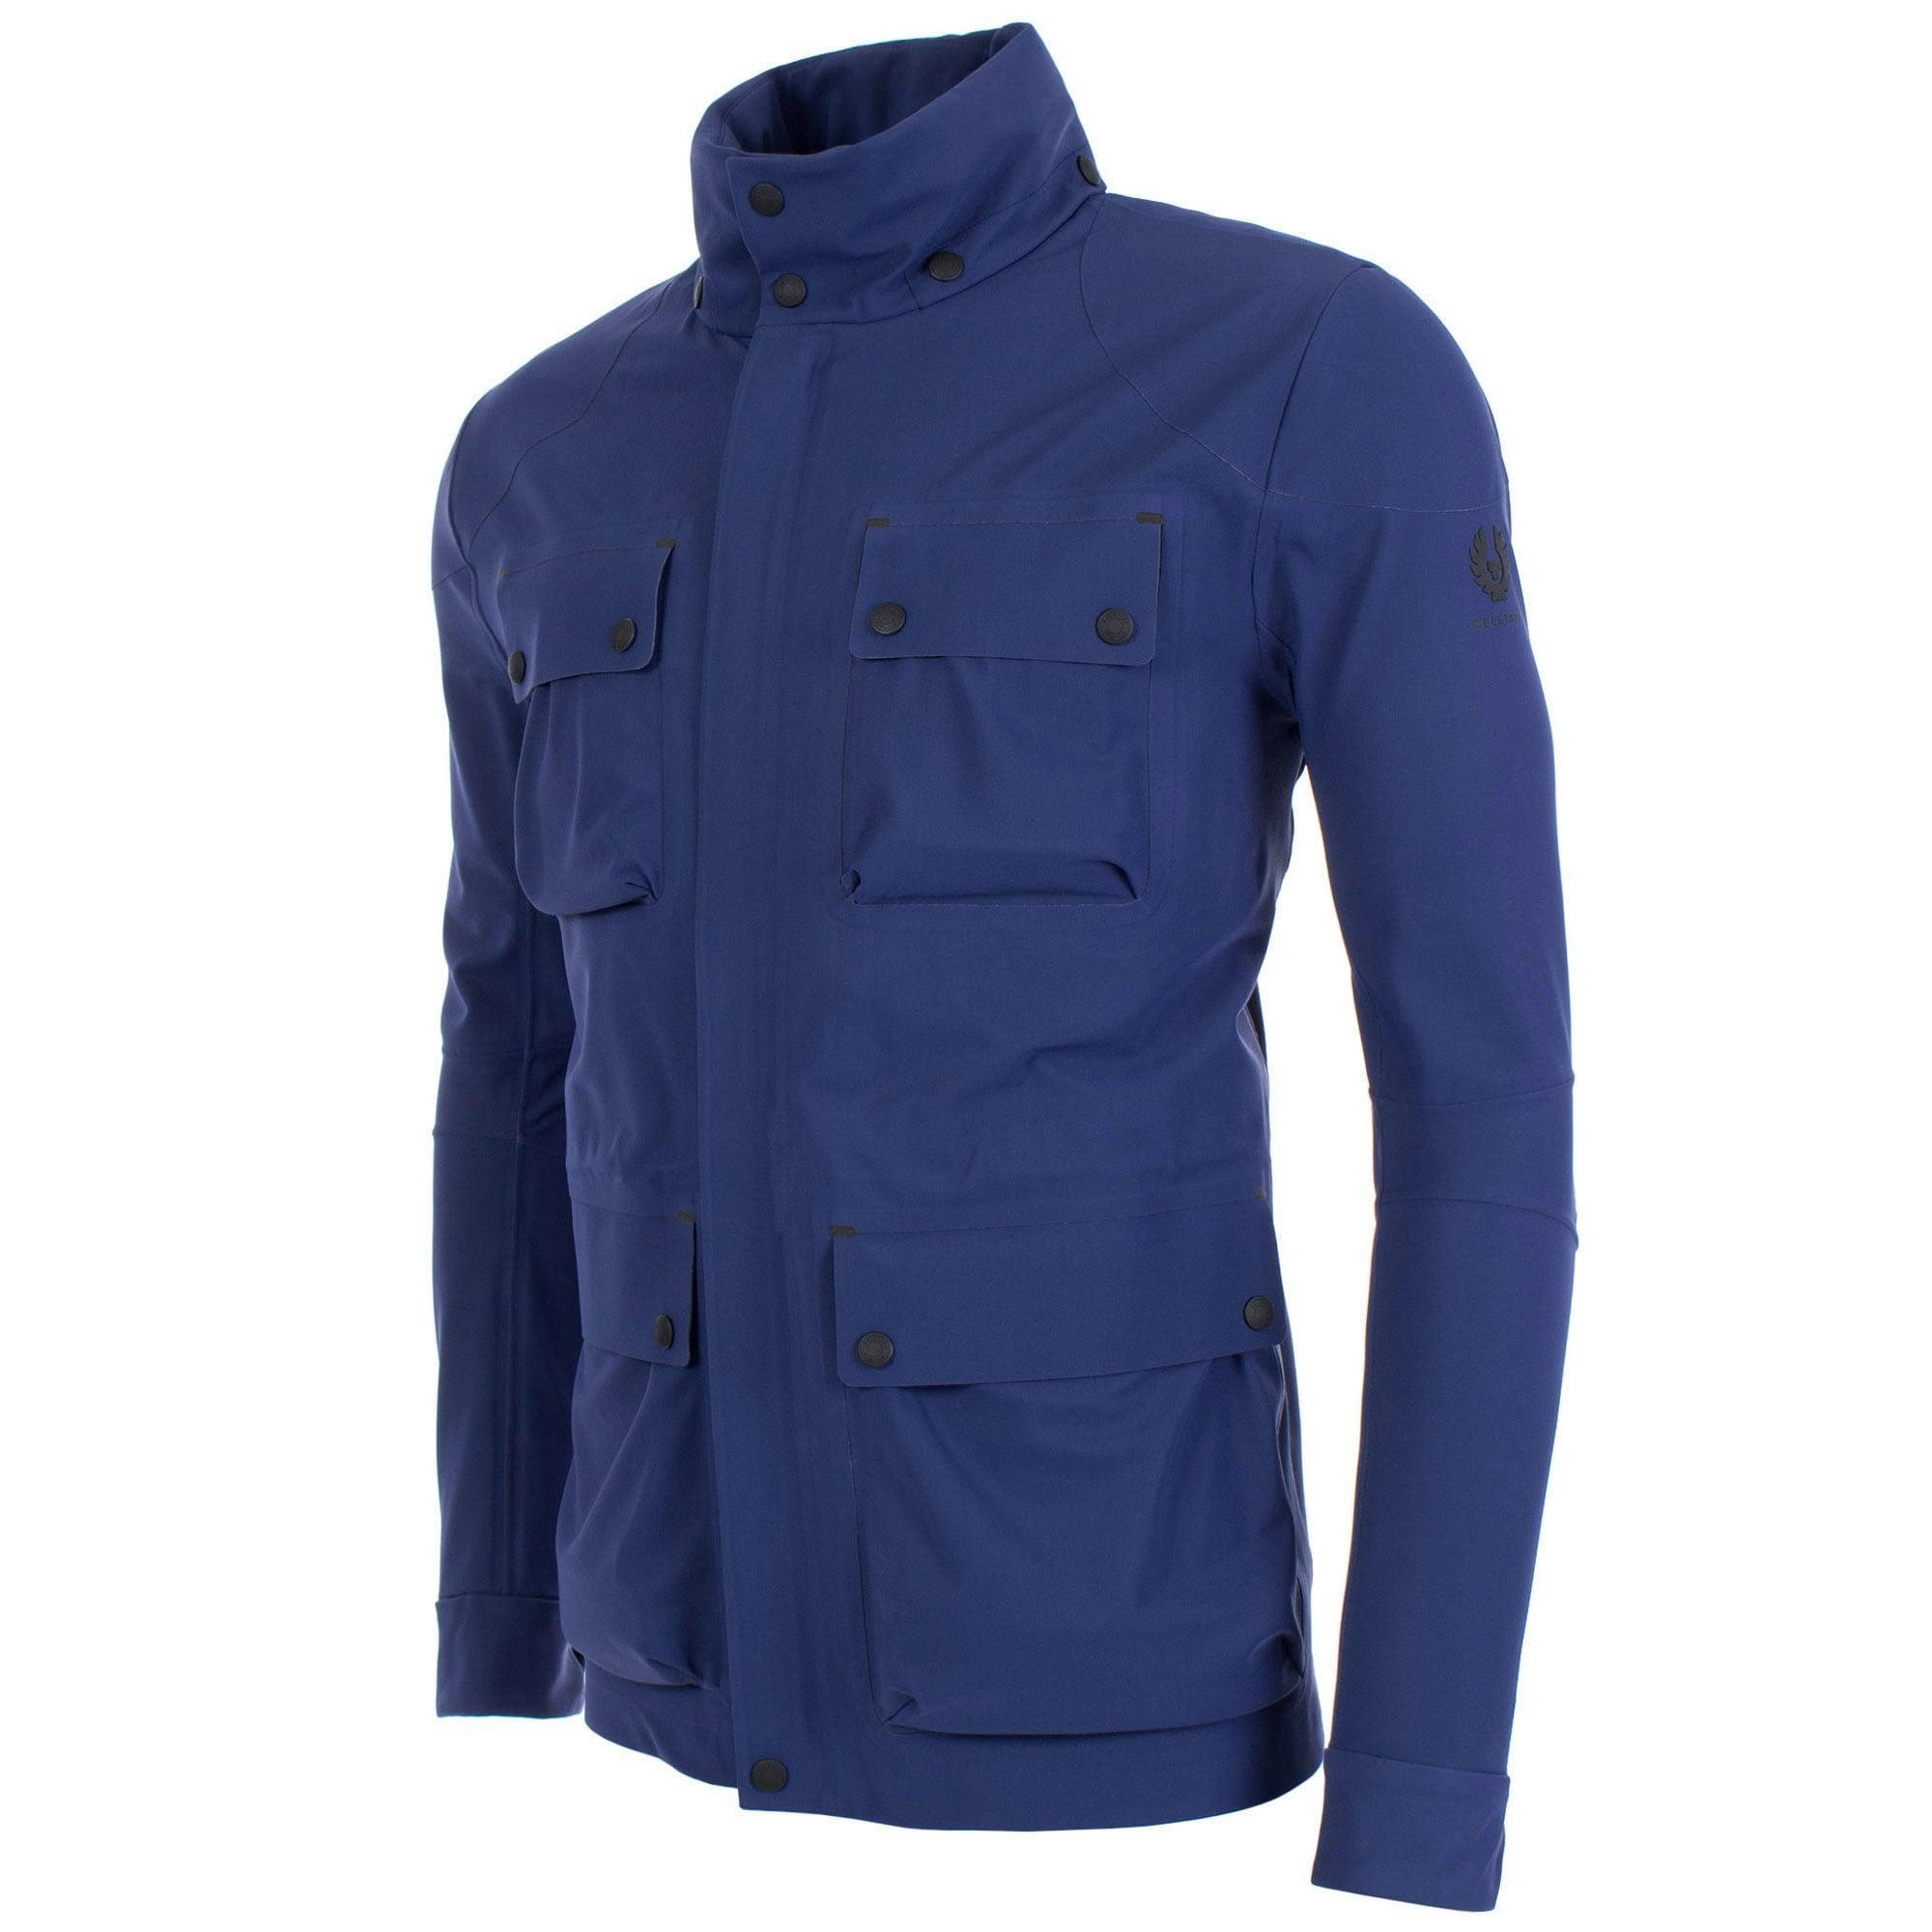 9b1541cb3a5 Belstaff Trialmaster Evo Jacket in Blue for Men - Lyst